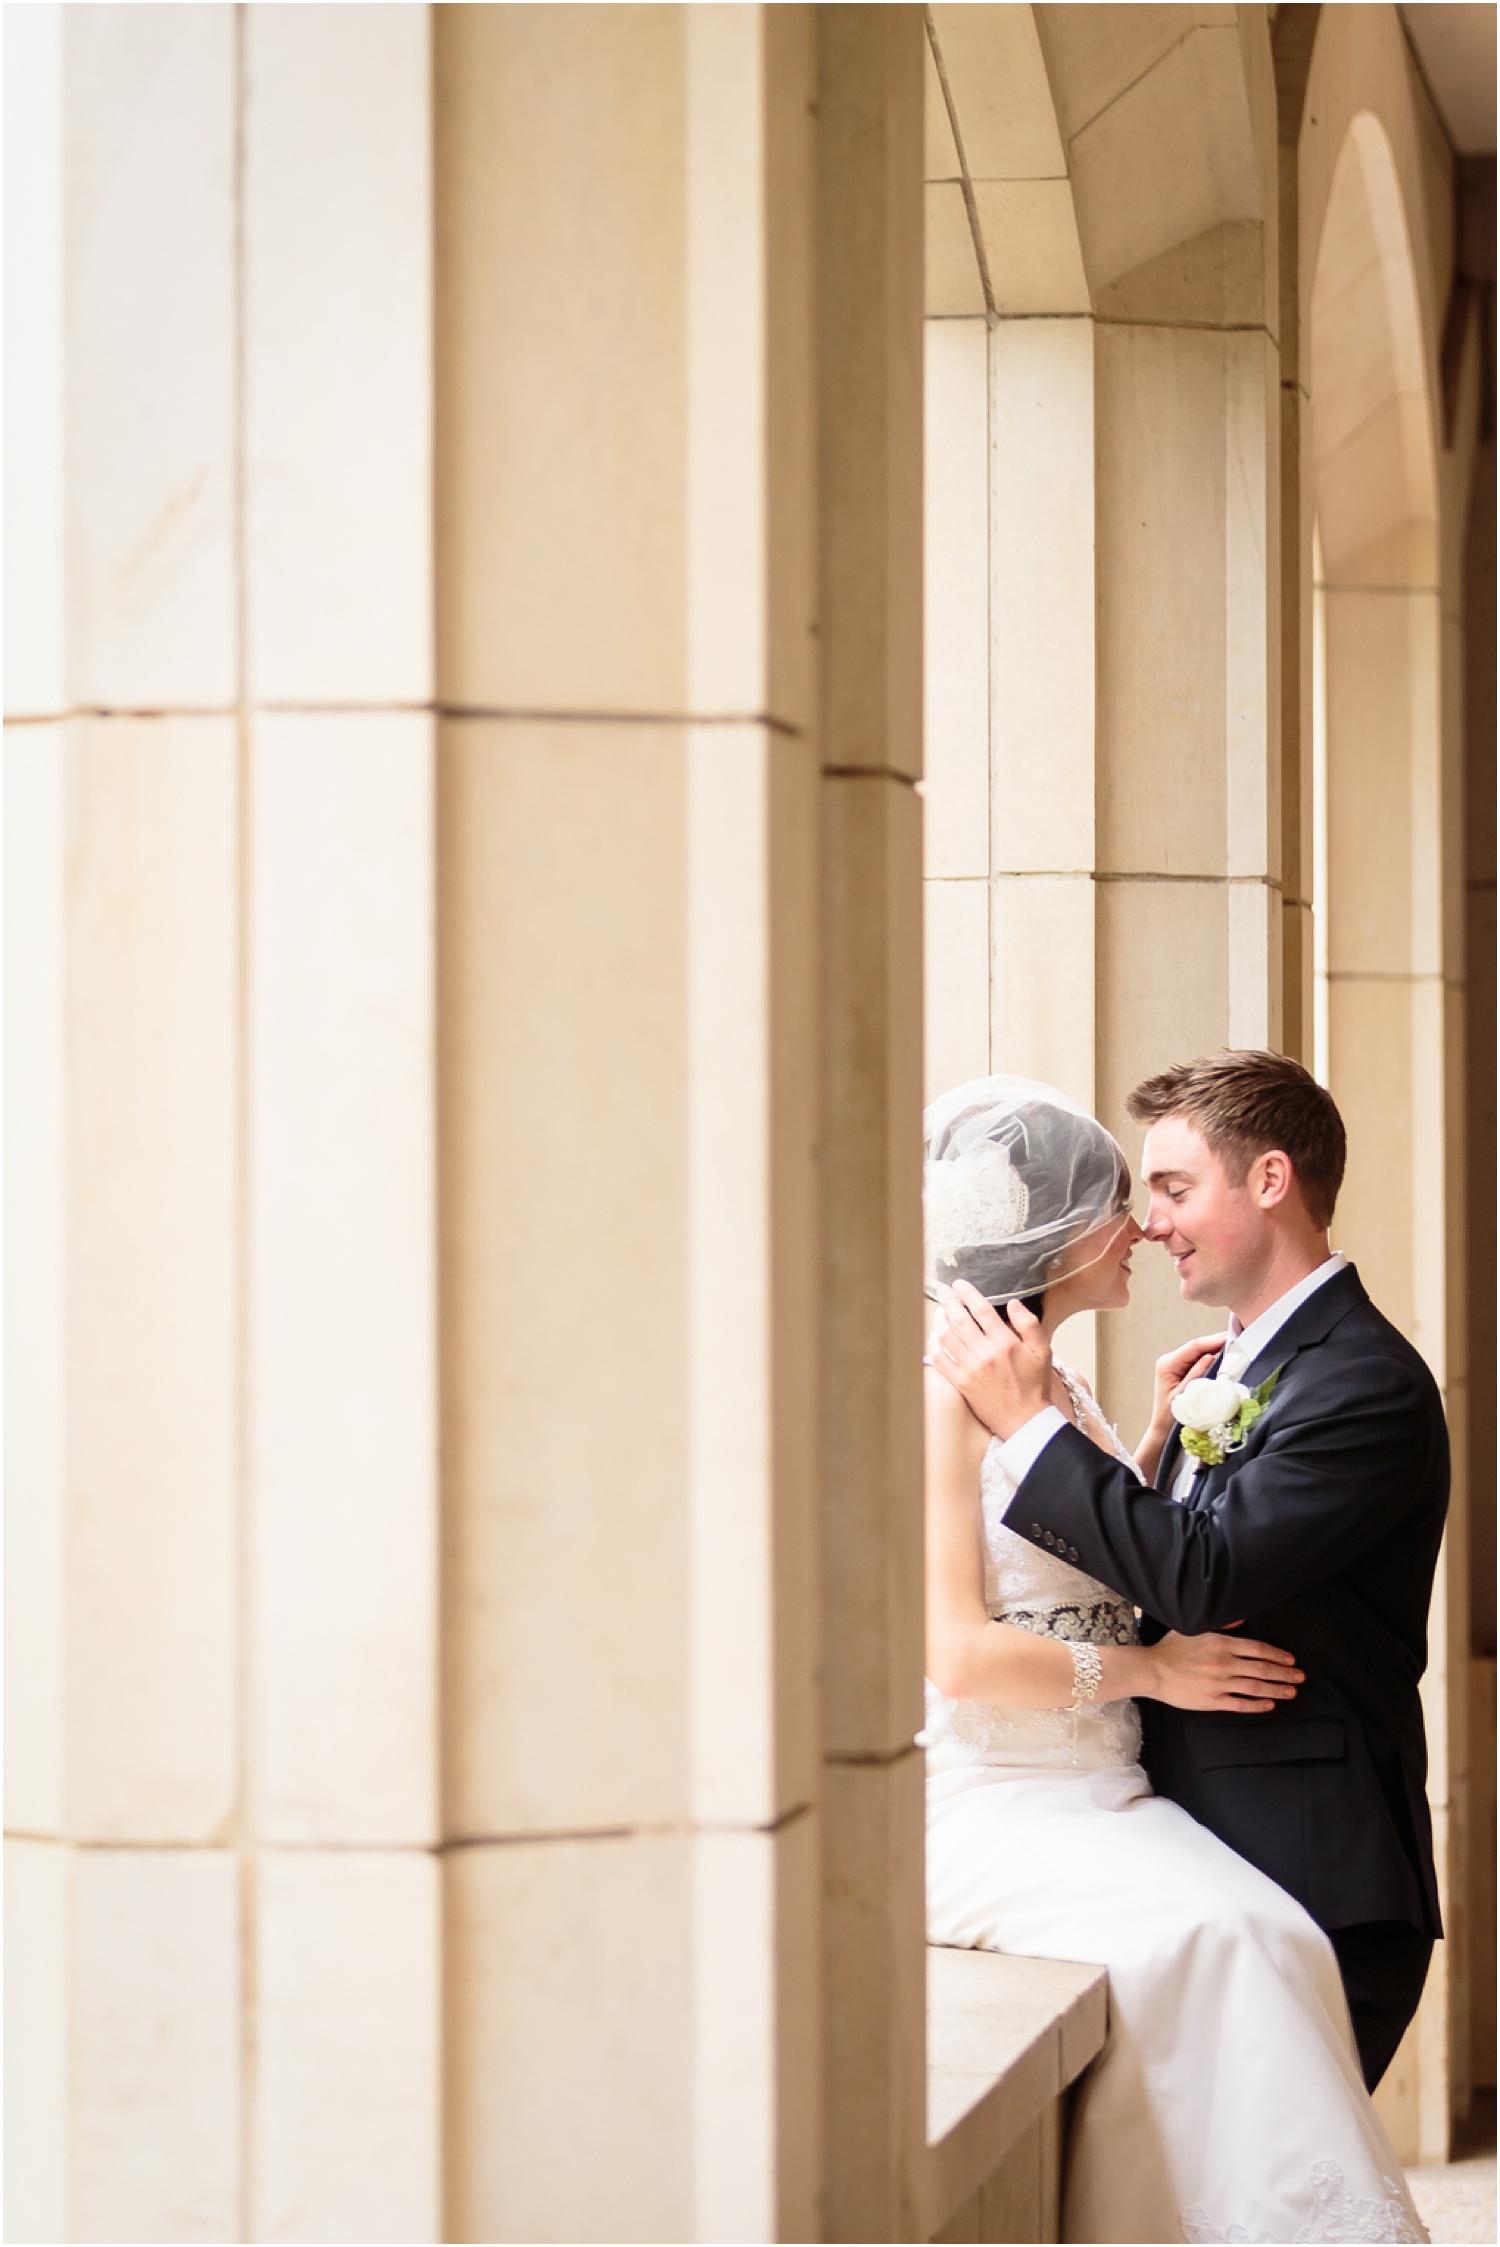 20150314-texas-outdoor-wedding-45_blog.jpg